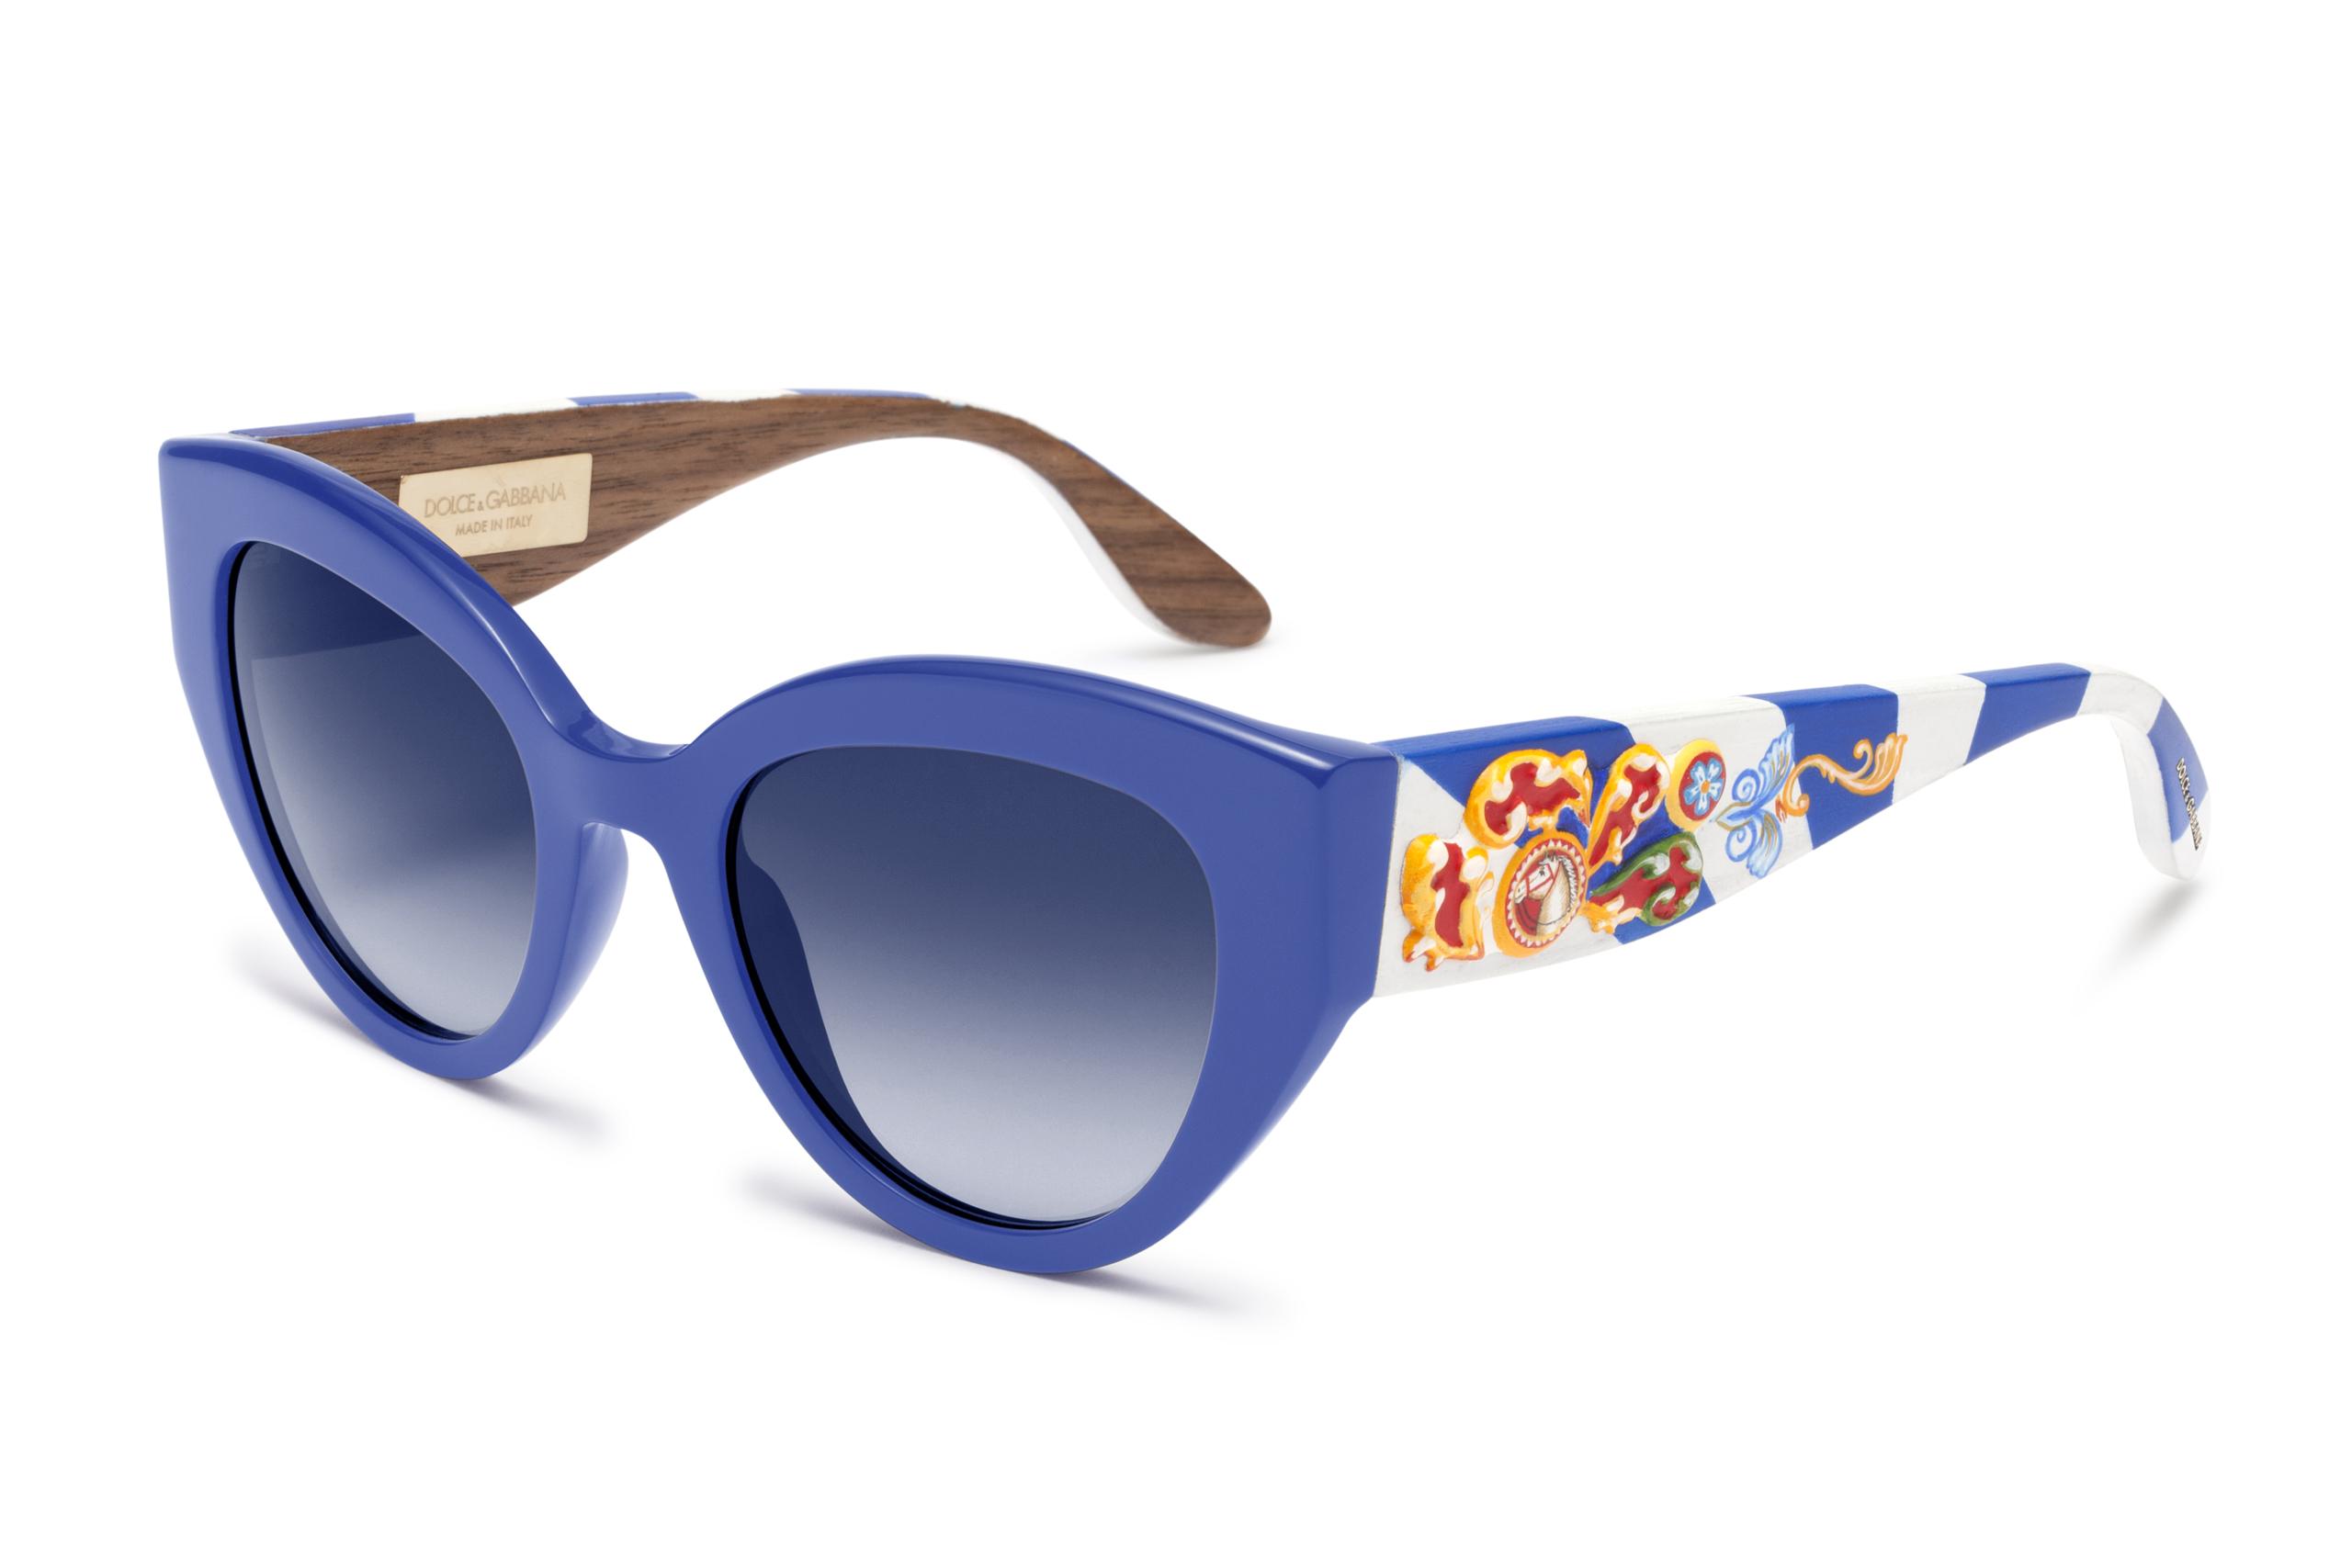 Foto de Gafas de sol Dolce Gabbana Sicilian Carretto (8/12)